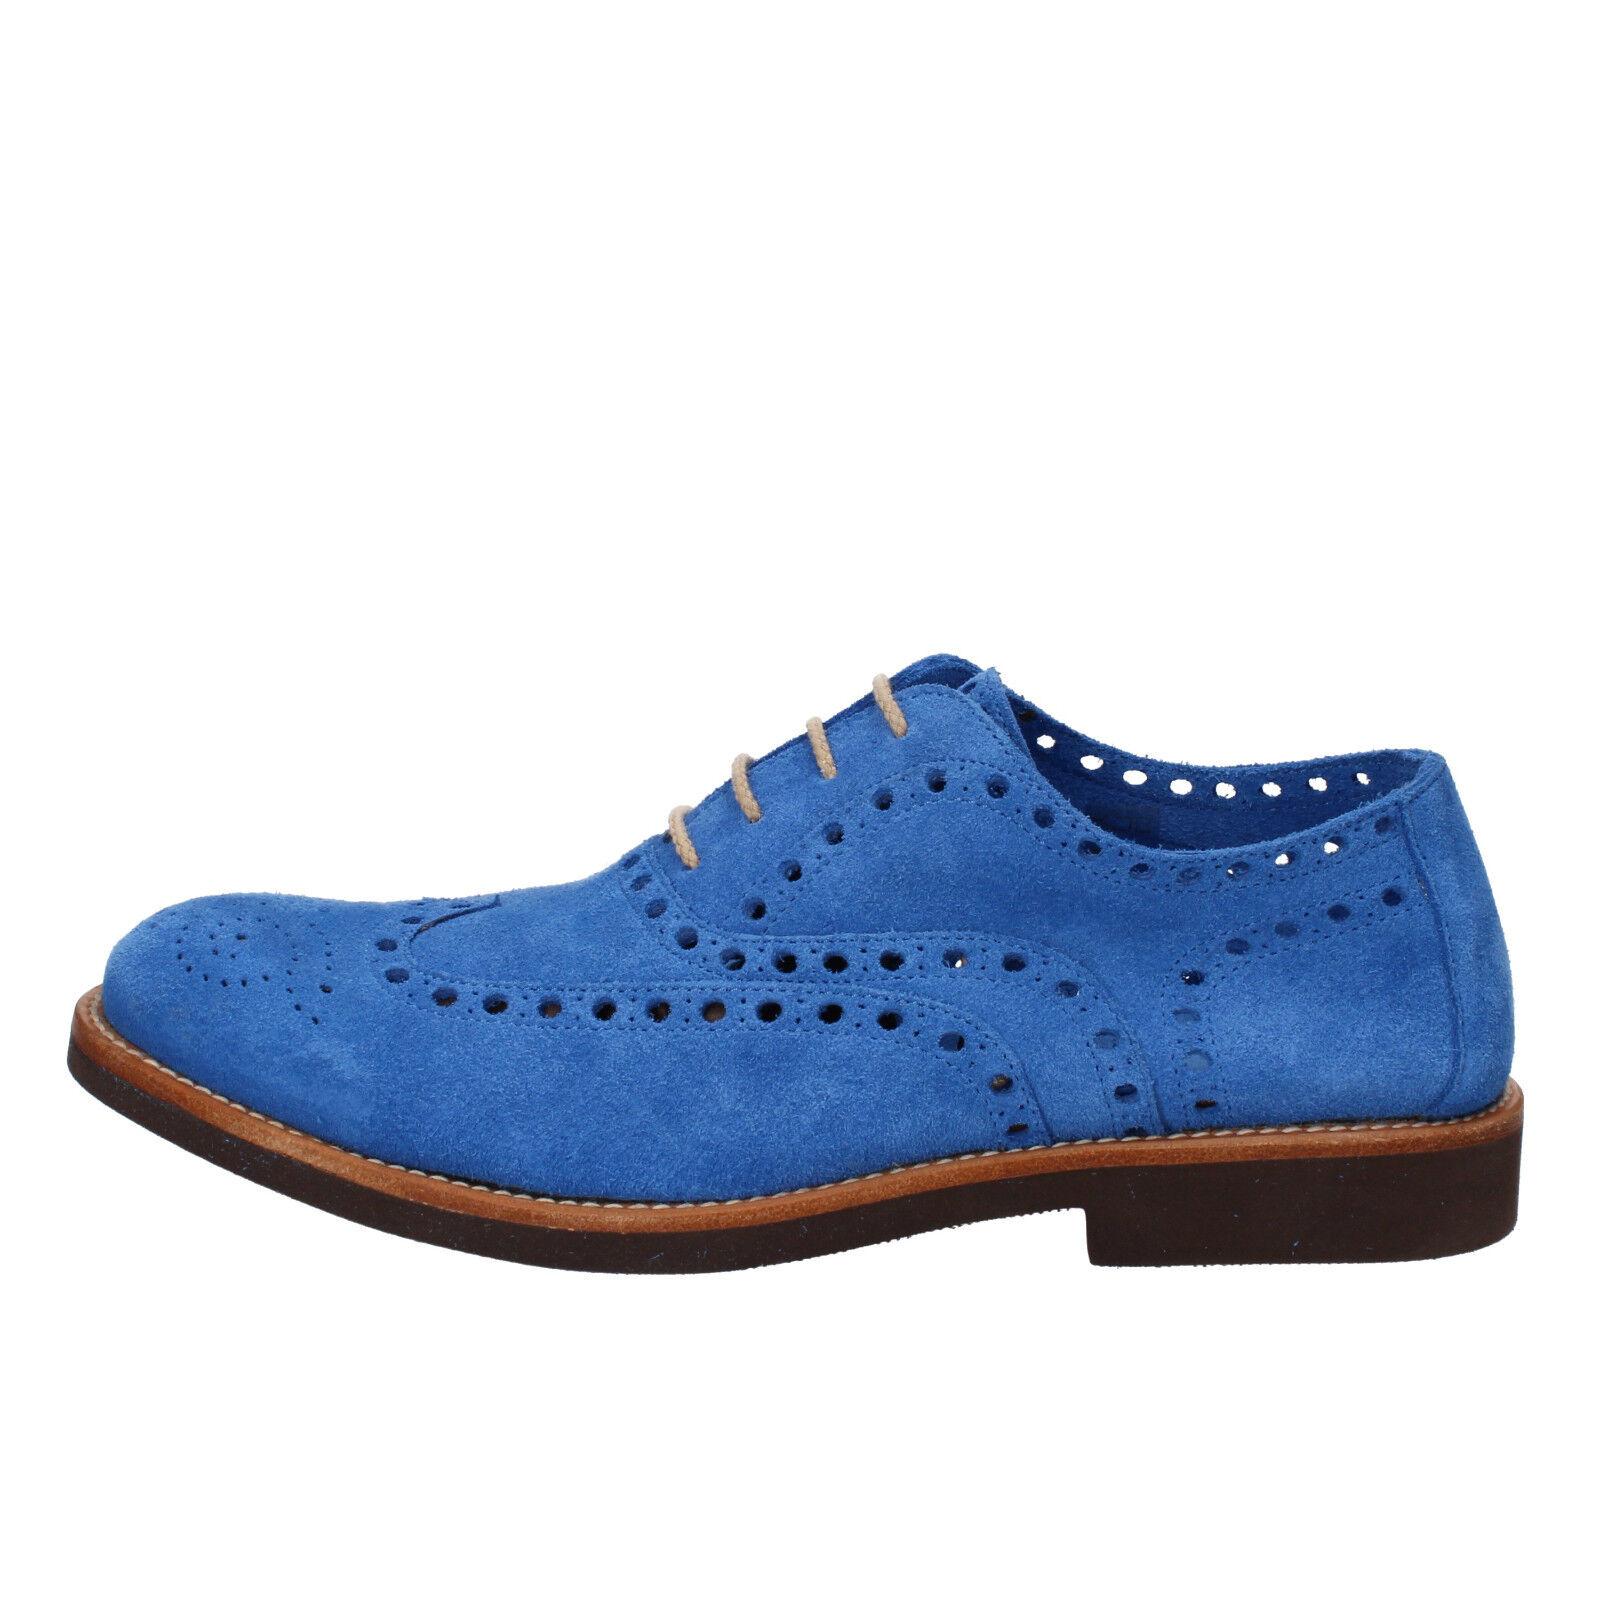 Men's shoes DI MELLA 11 () elegant bluee suede AD234-M